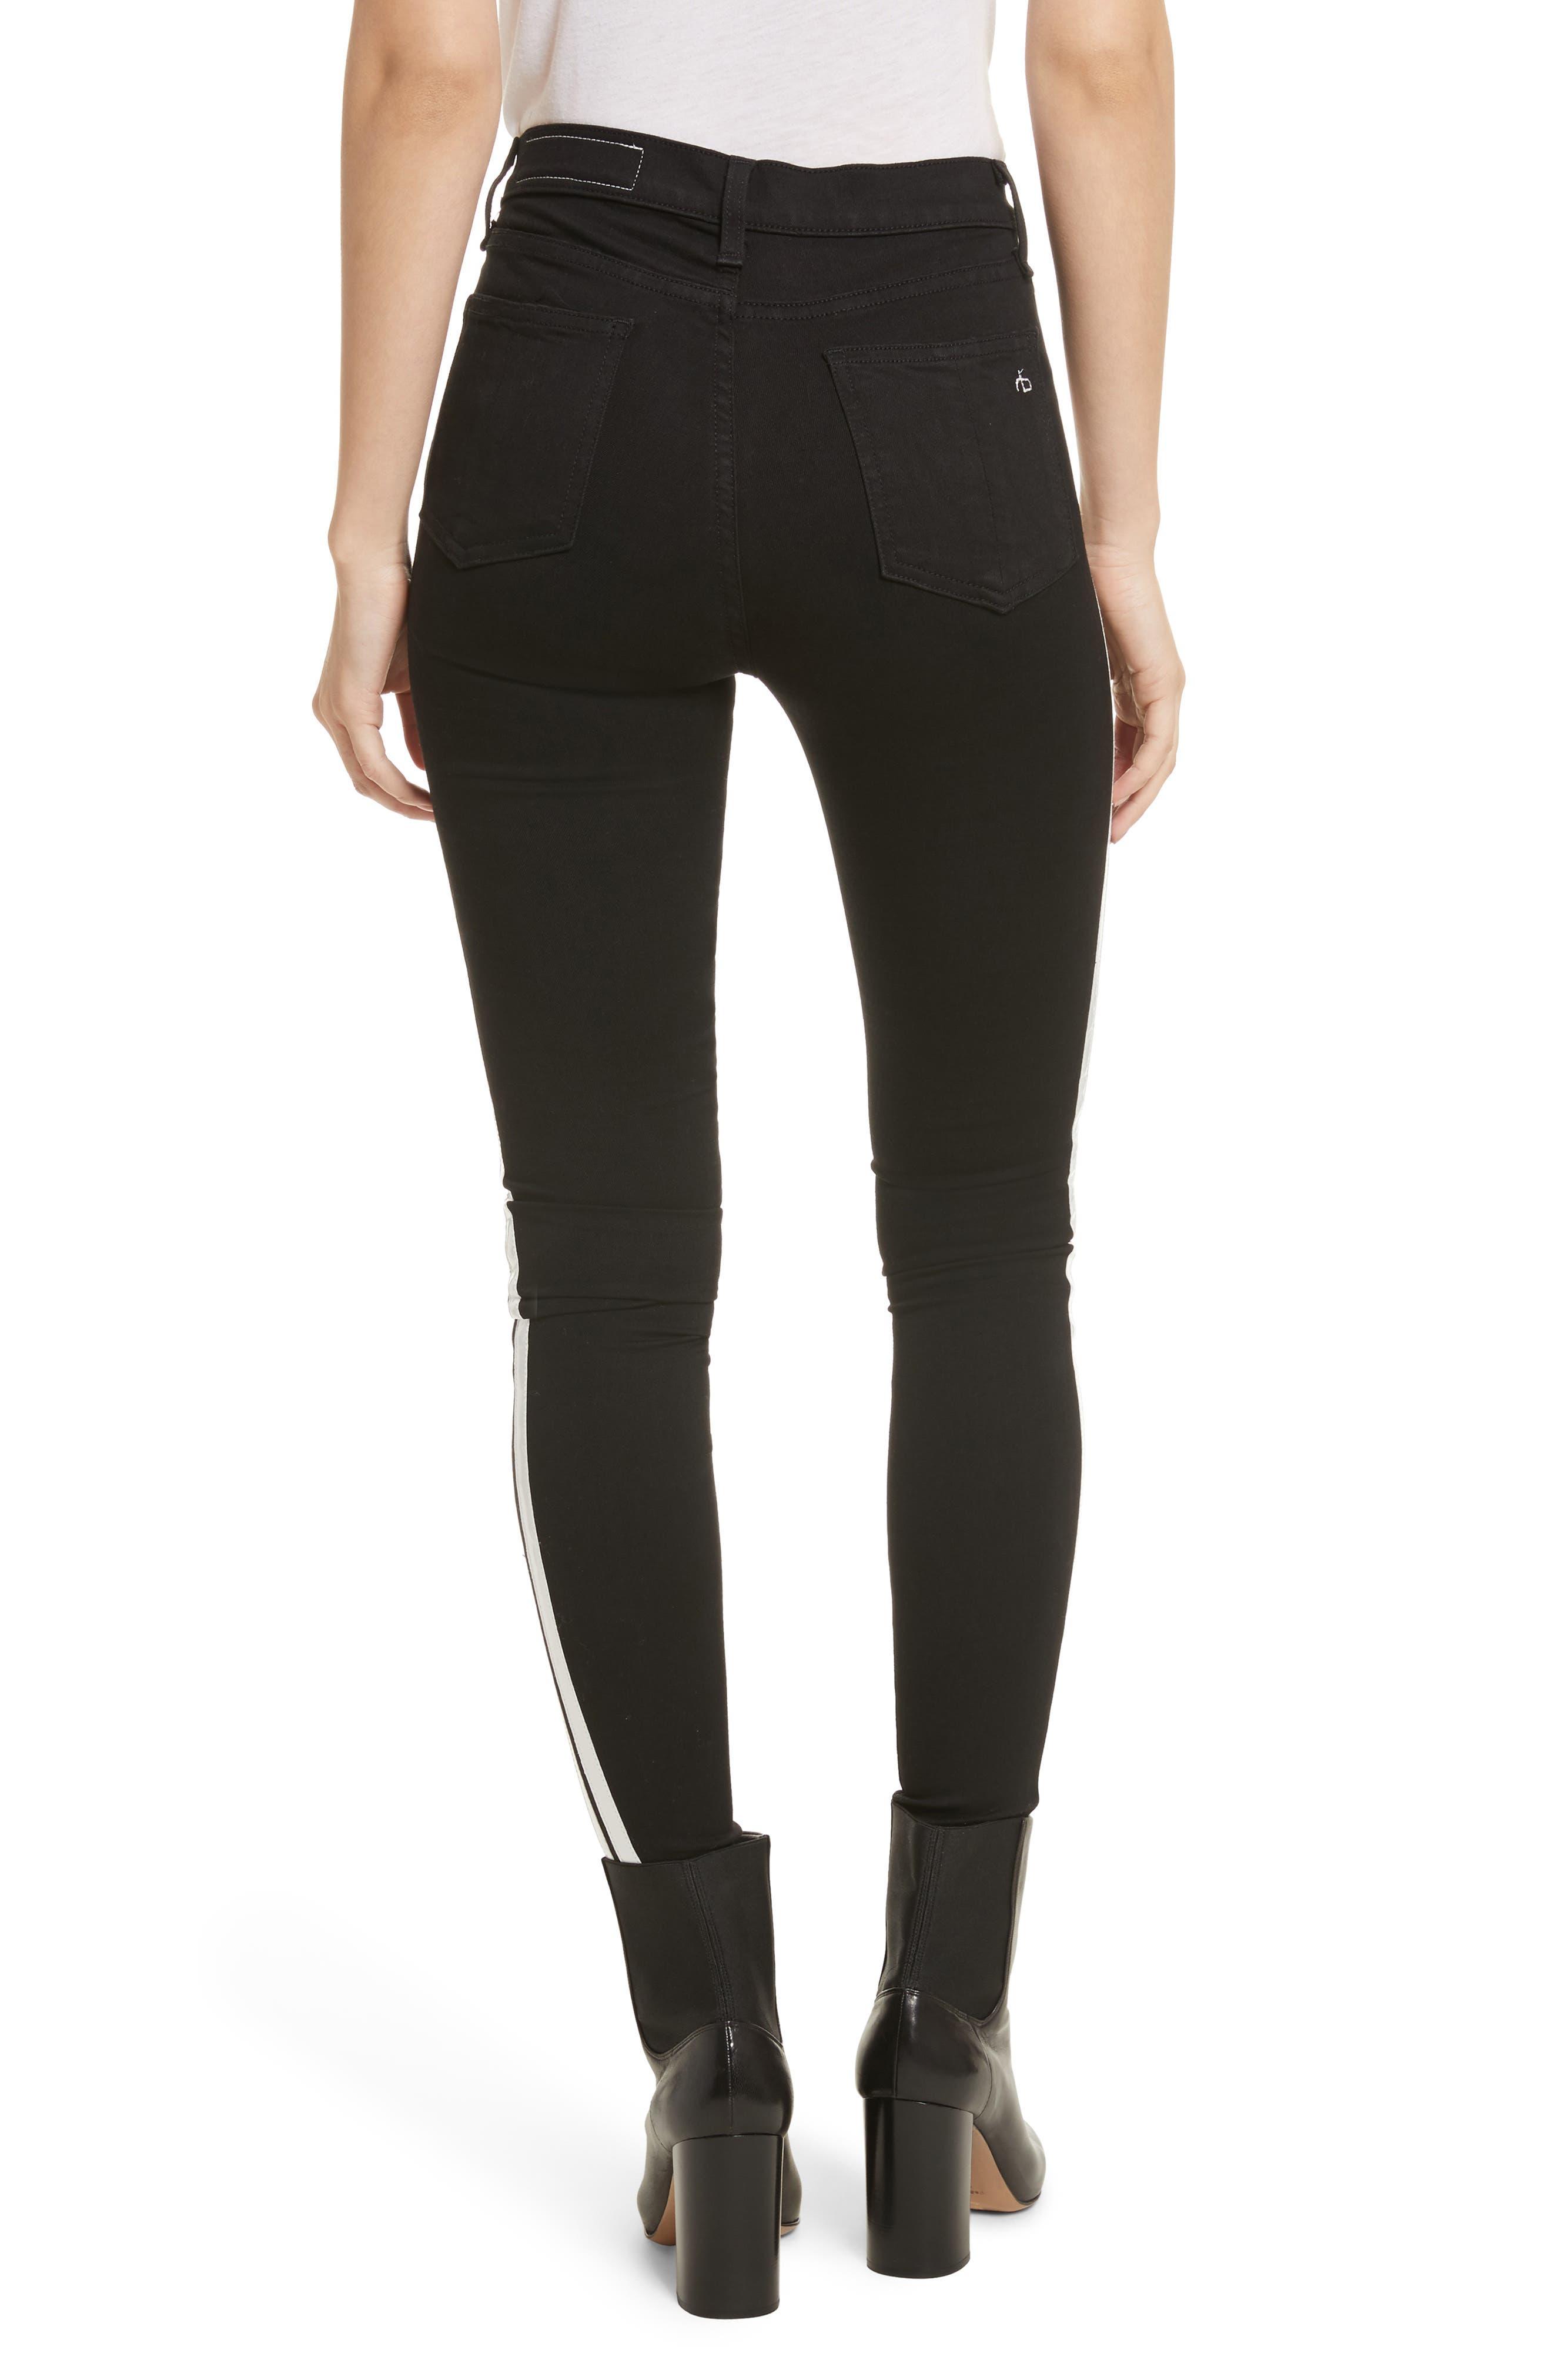 Mito High Waist Skinny Jeans,                             Alternate thumbnail 2, color,                             Black